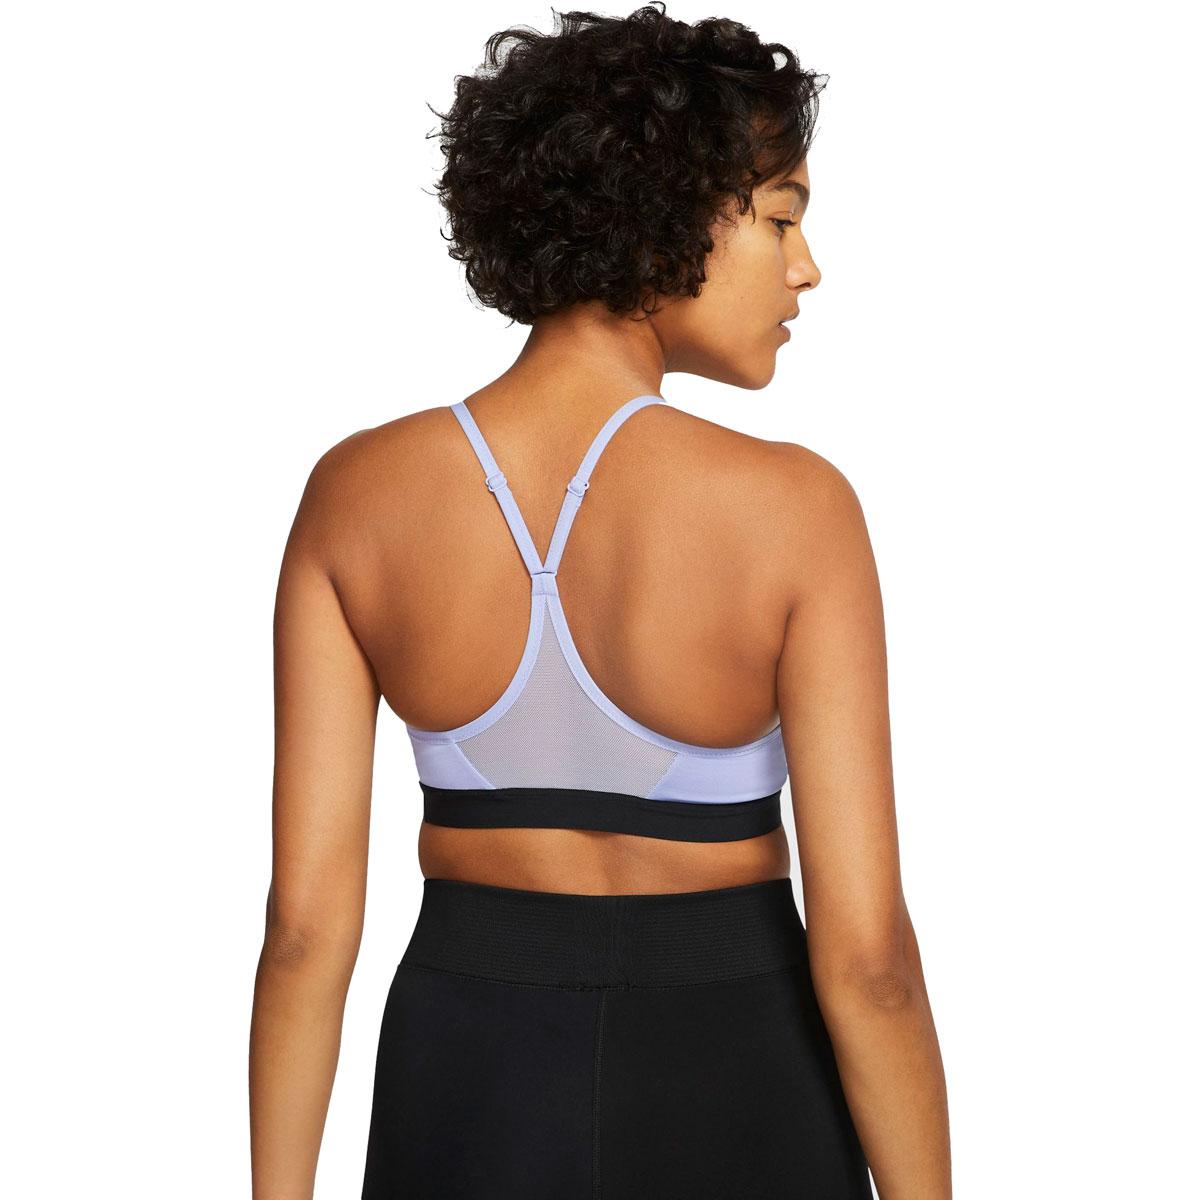 Women's Nike Indy Light-Support Sports Bra - Color: Light Thistle/Black/Black - Size: XS, Light Thistle/Black/Black, large, image 2